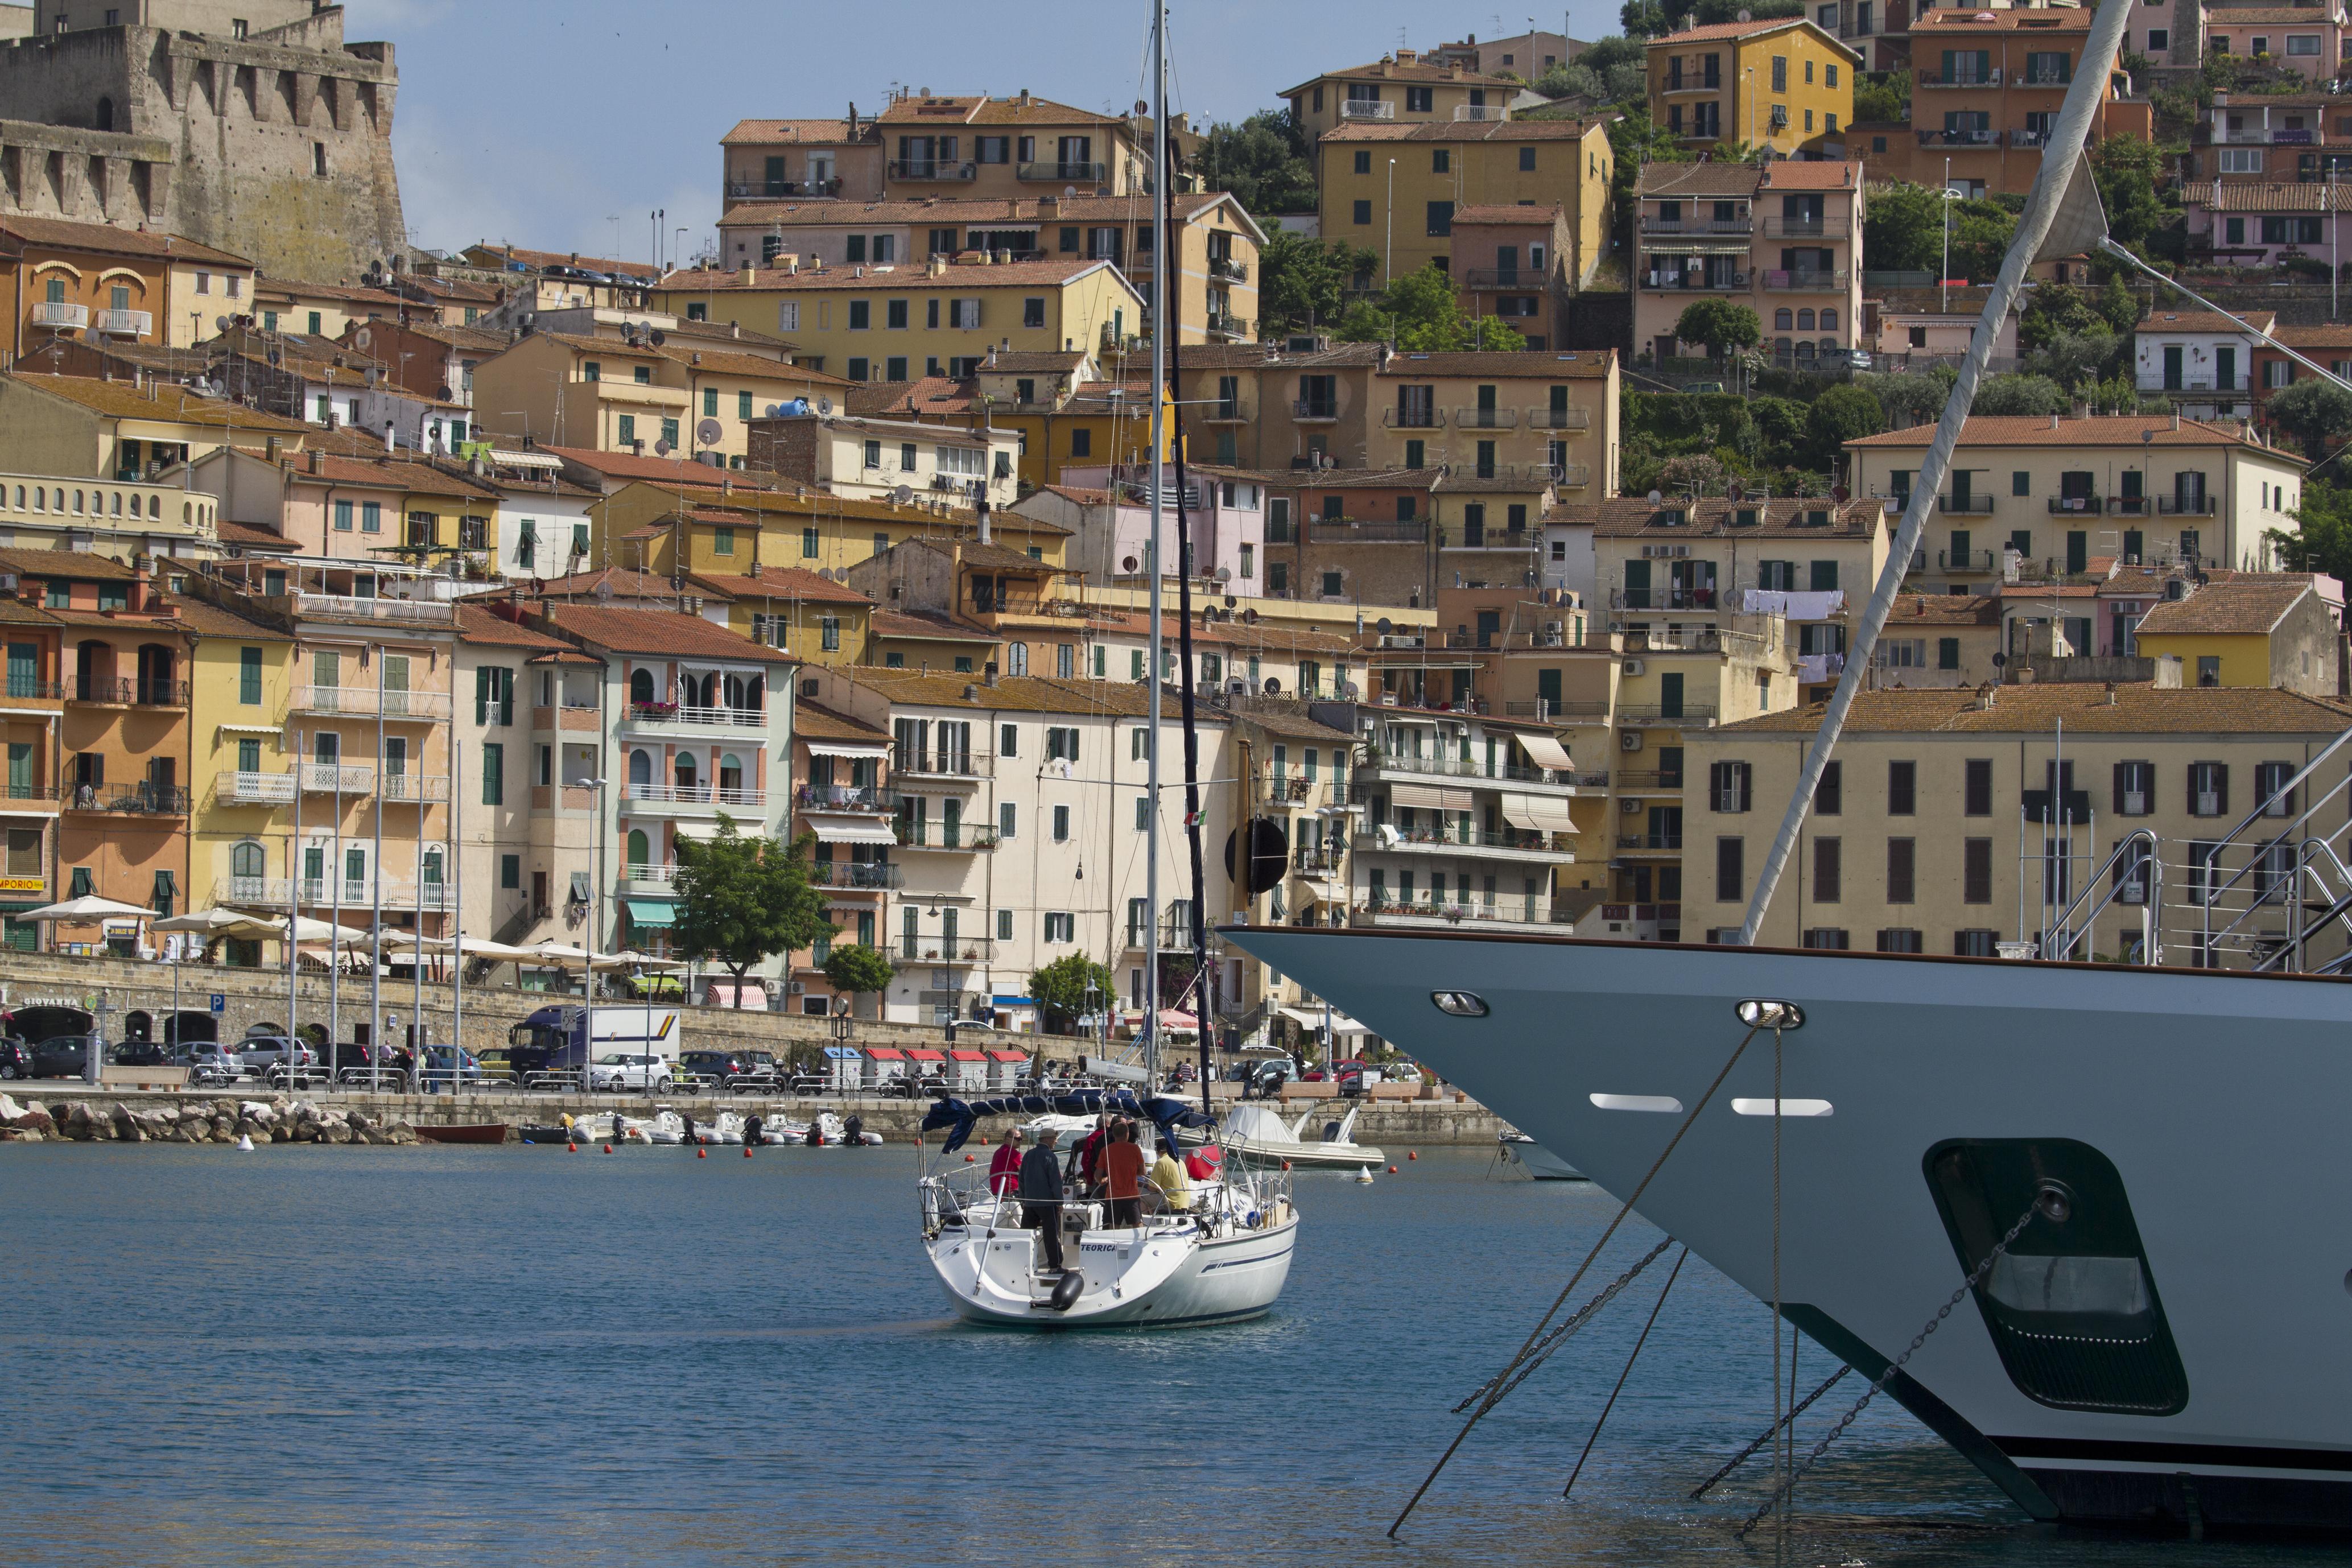 Porto Santo Stefano, porto Vecchio